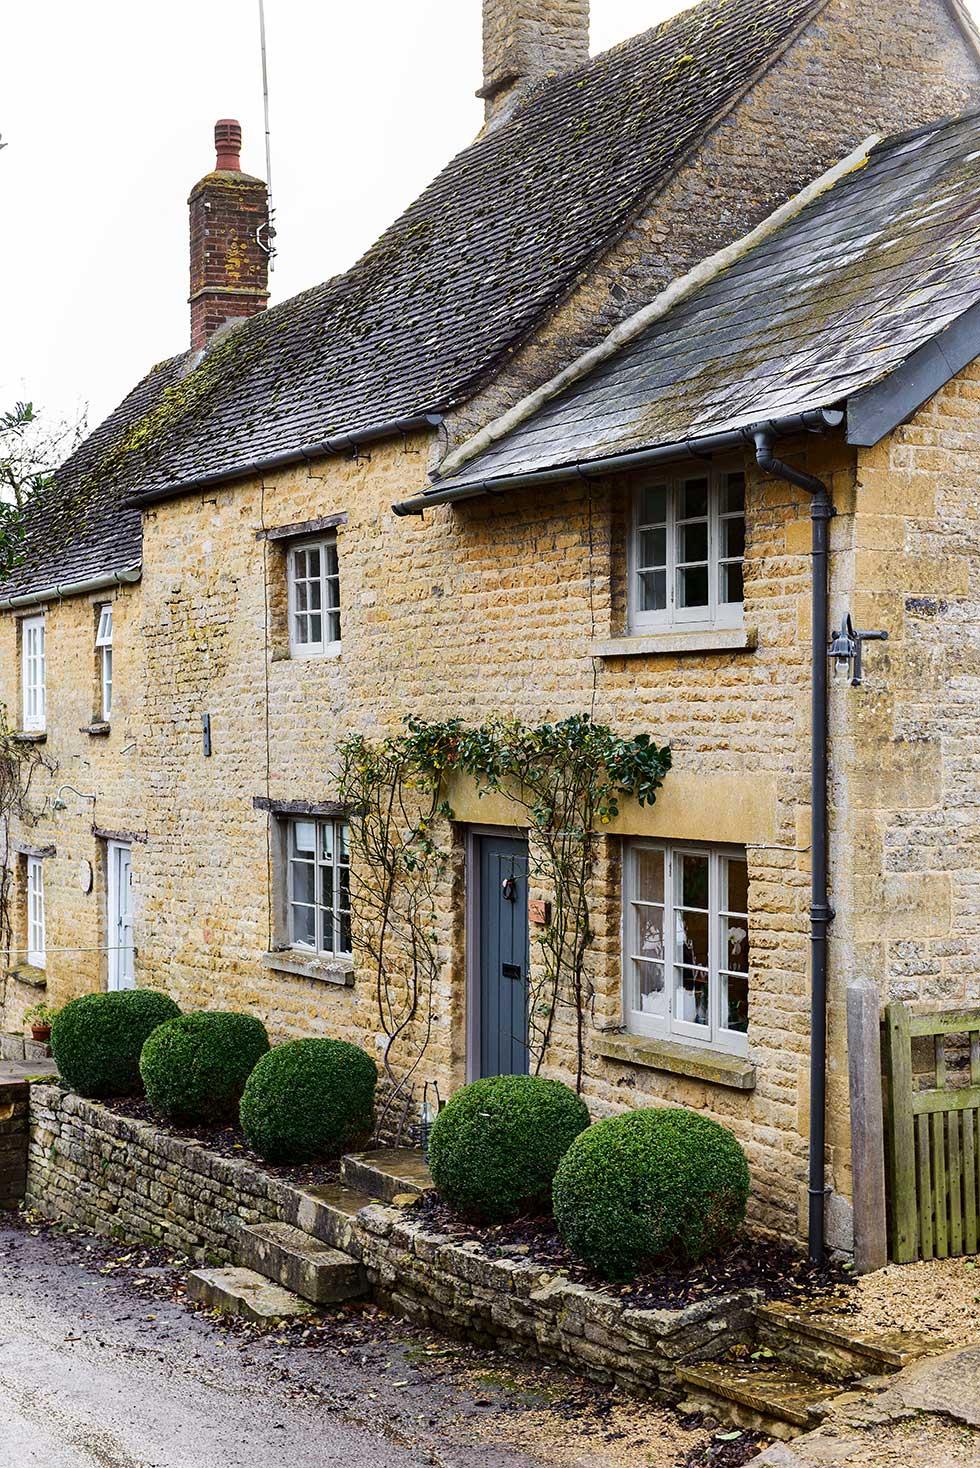 Lewis-powell-cottage-exterior